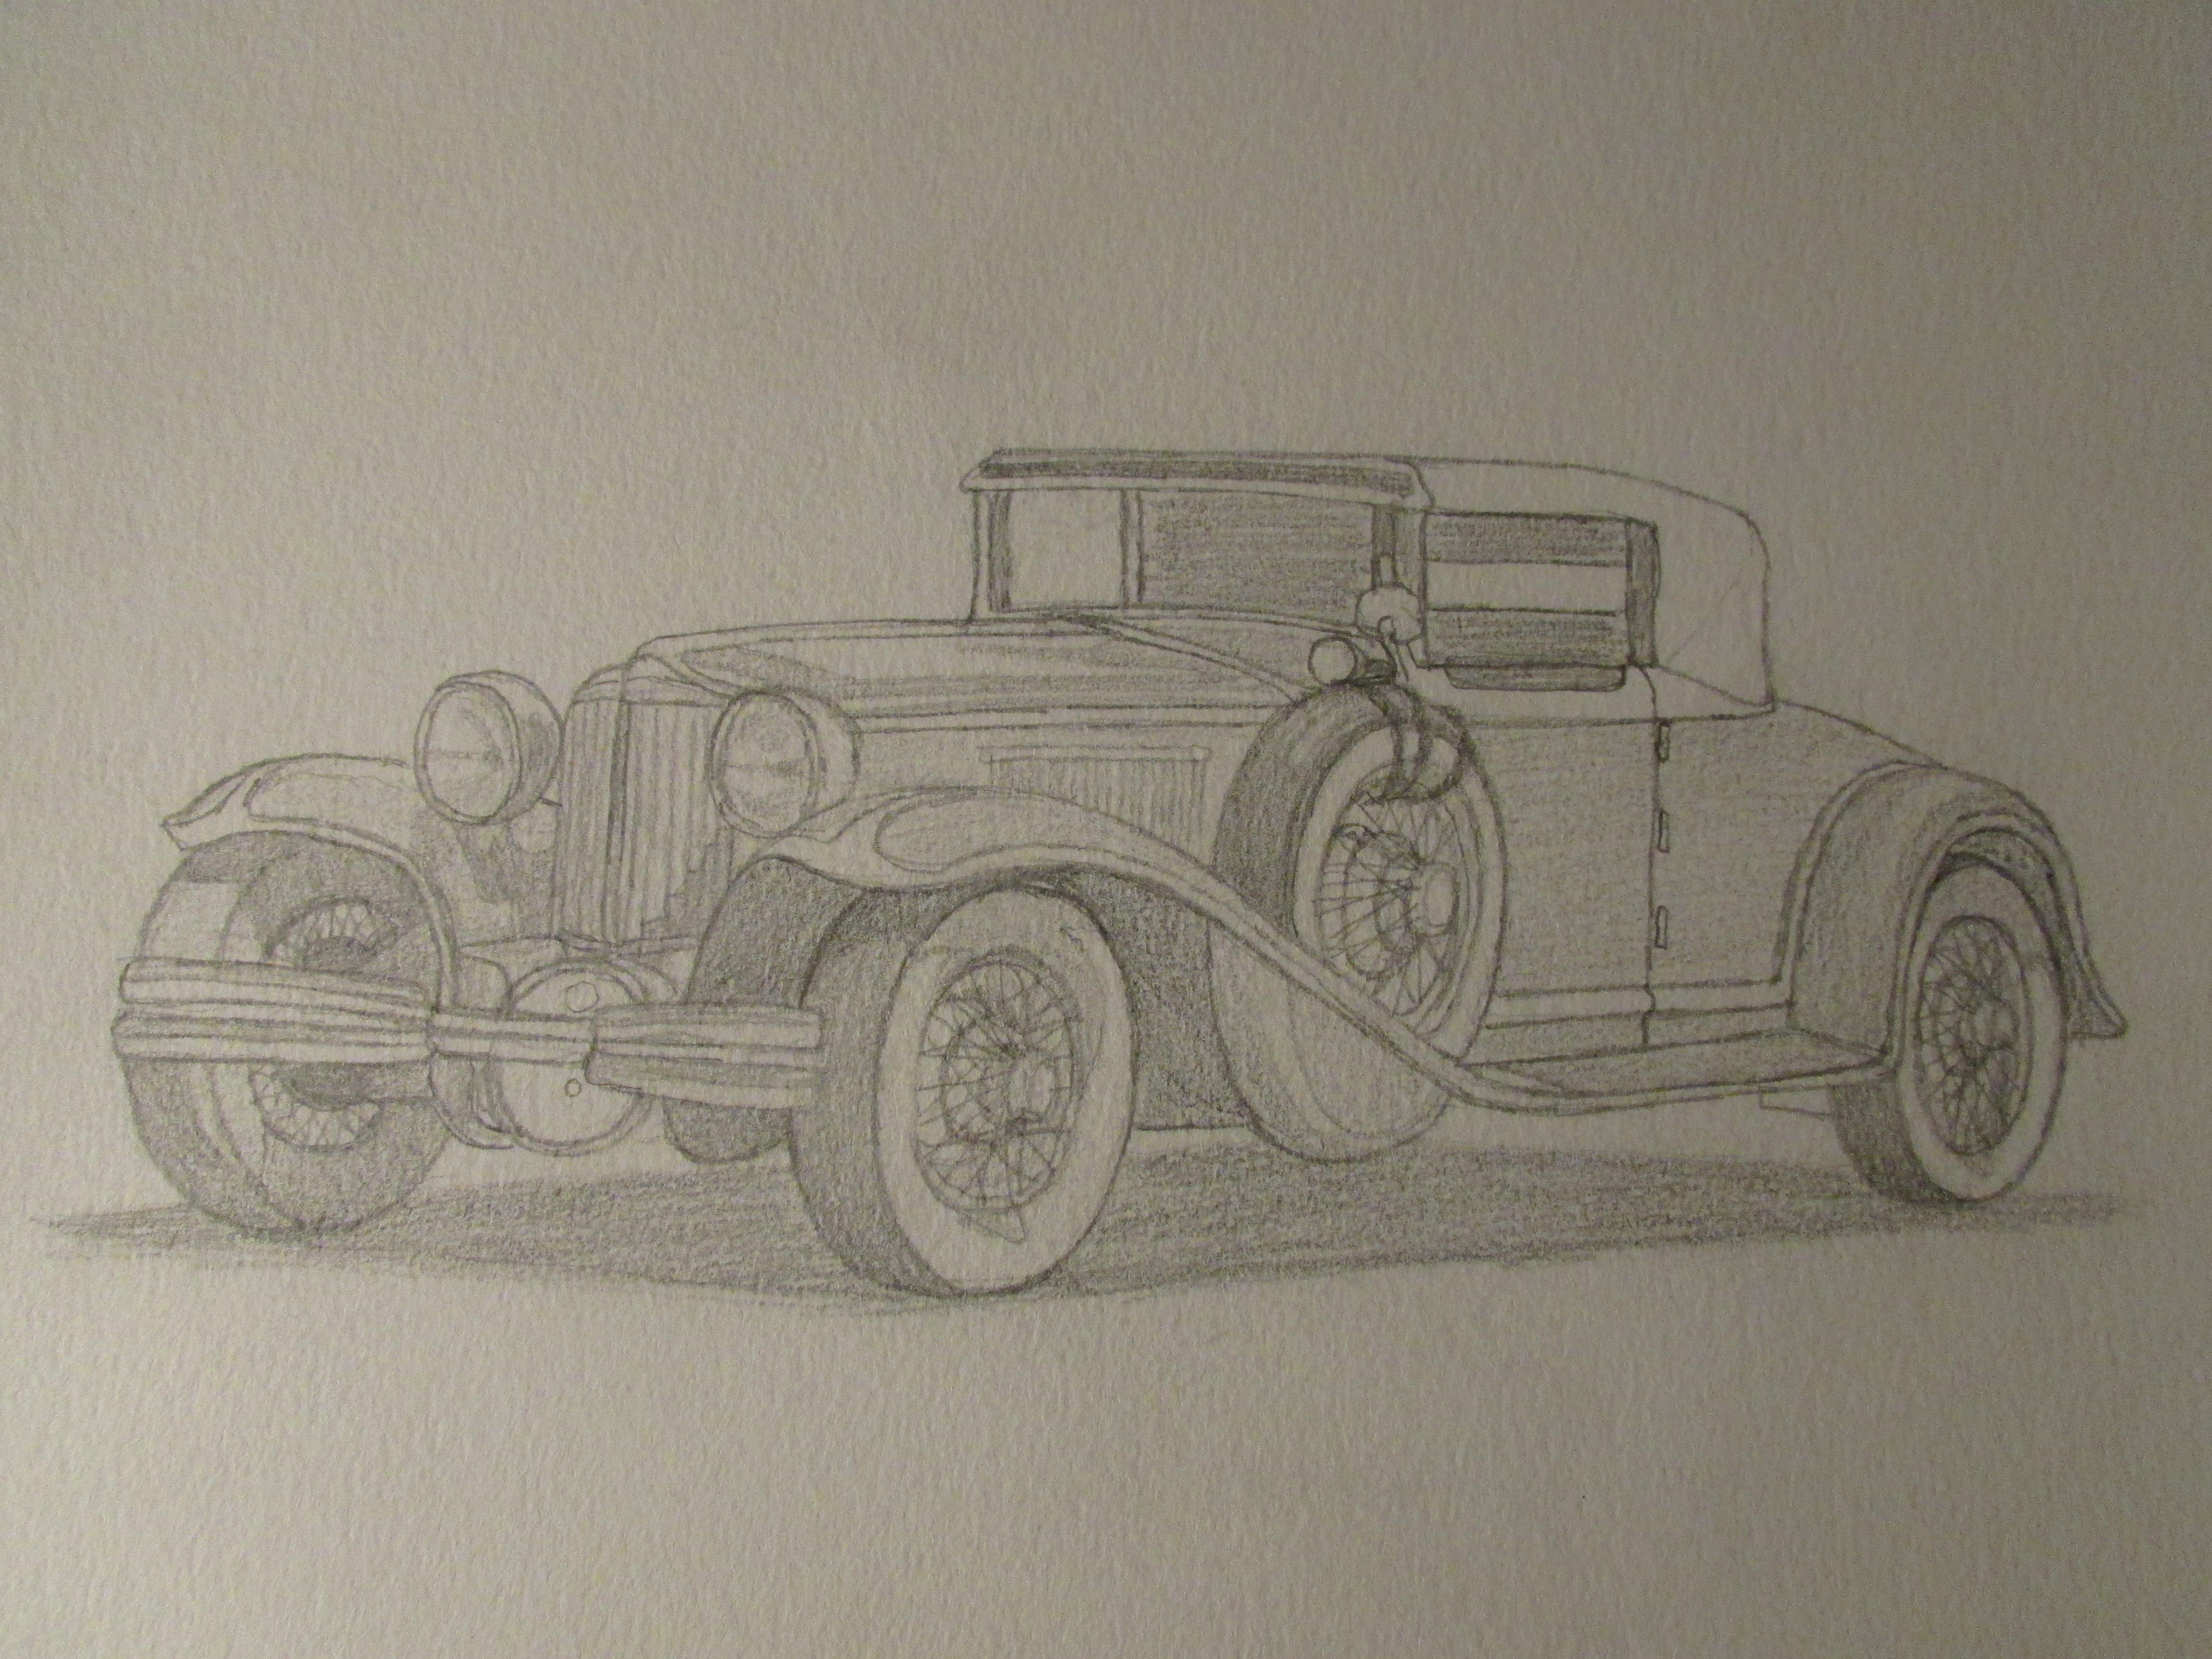 4608x3456 Painting Pencil Car Car Pencil Painting Bmw Pencil Drawing